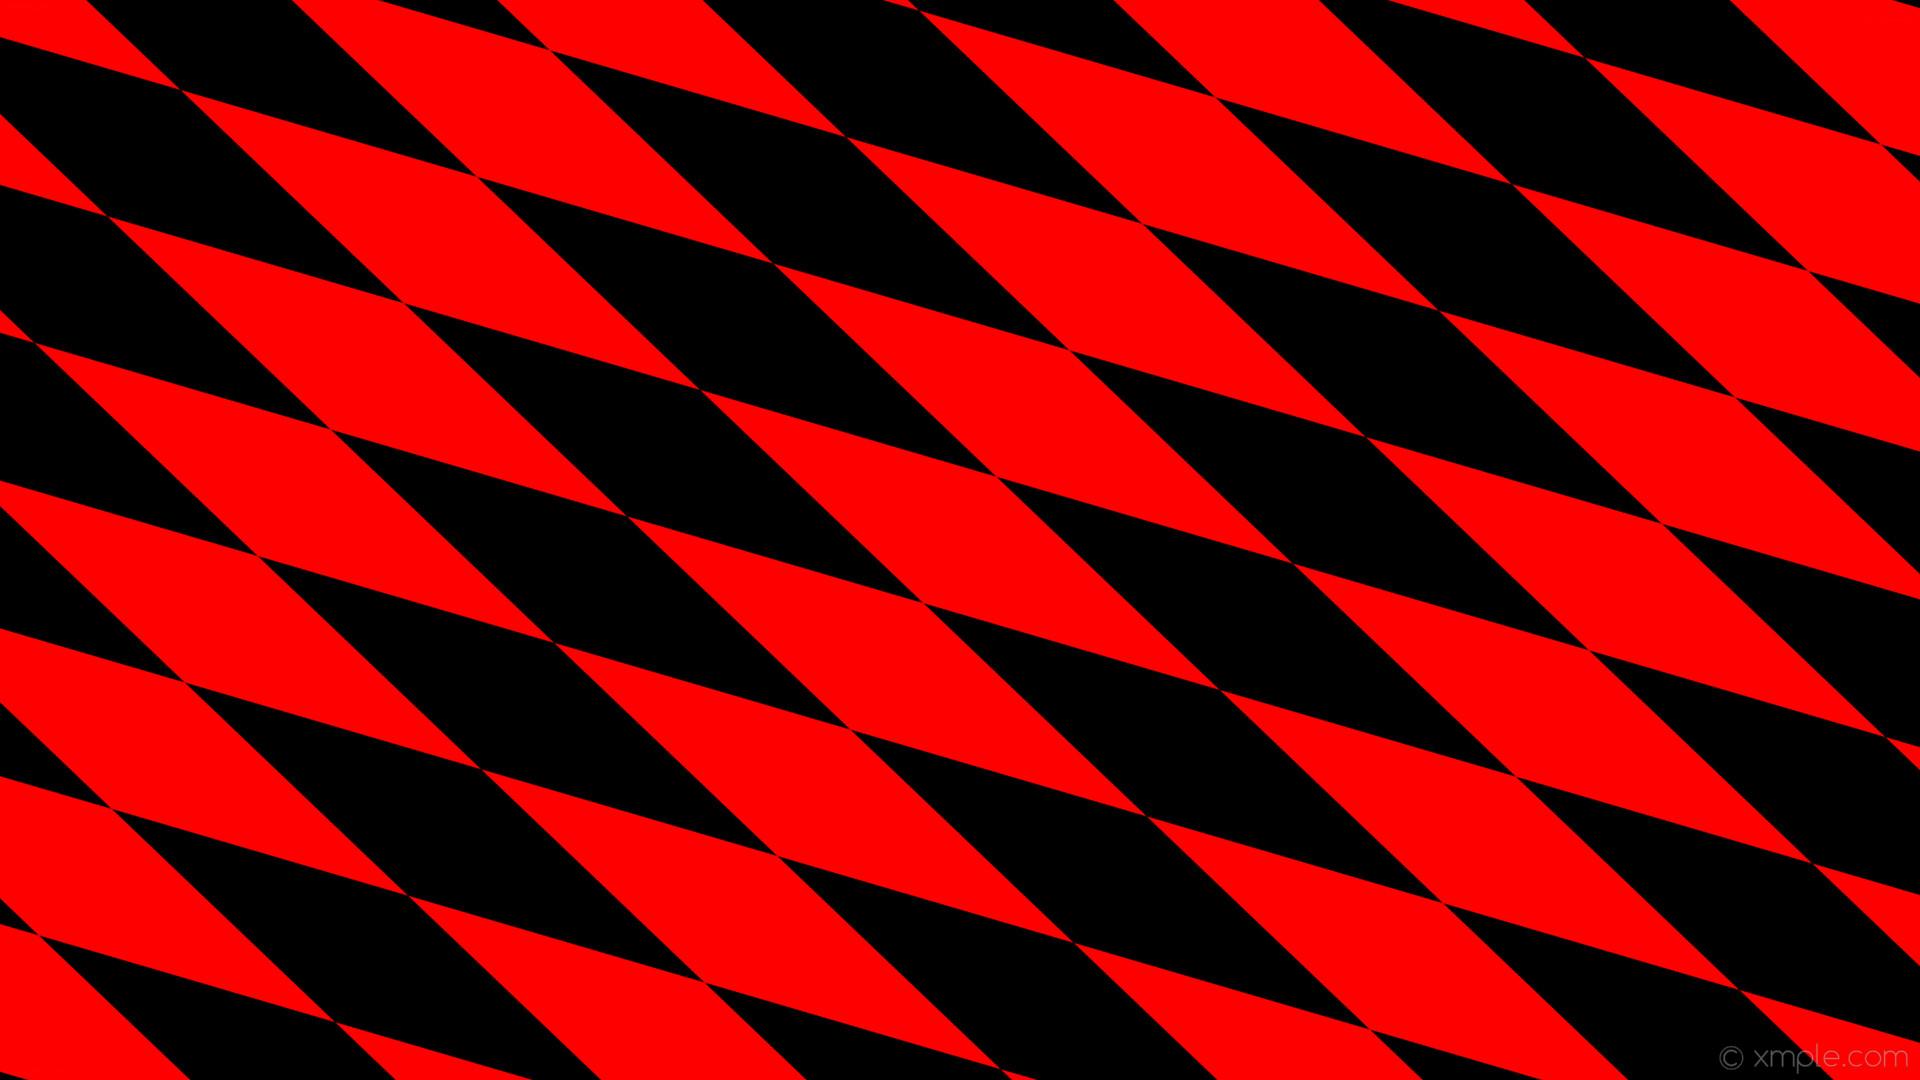 wallpaper rhombus diamond red black lozenge #ff0000 #000000 150° 600px 146px